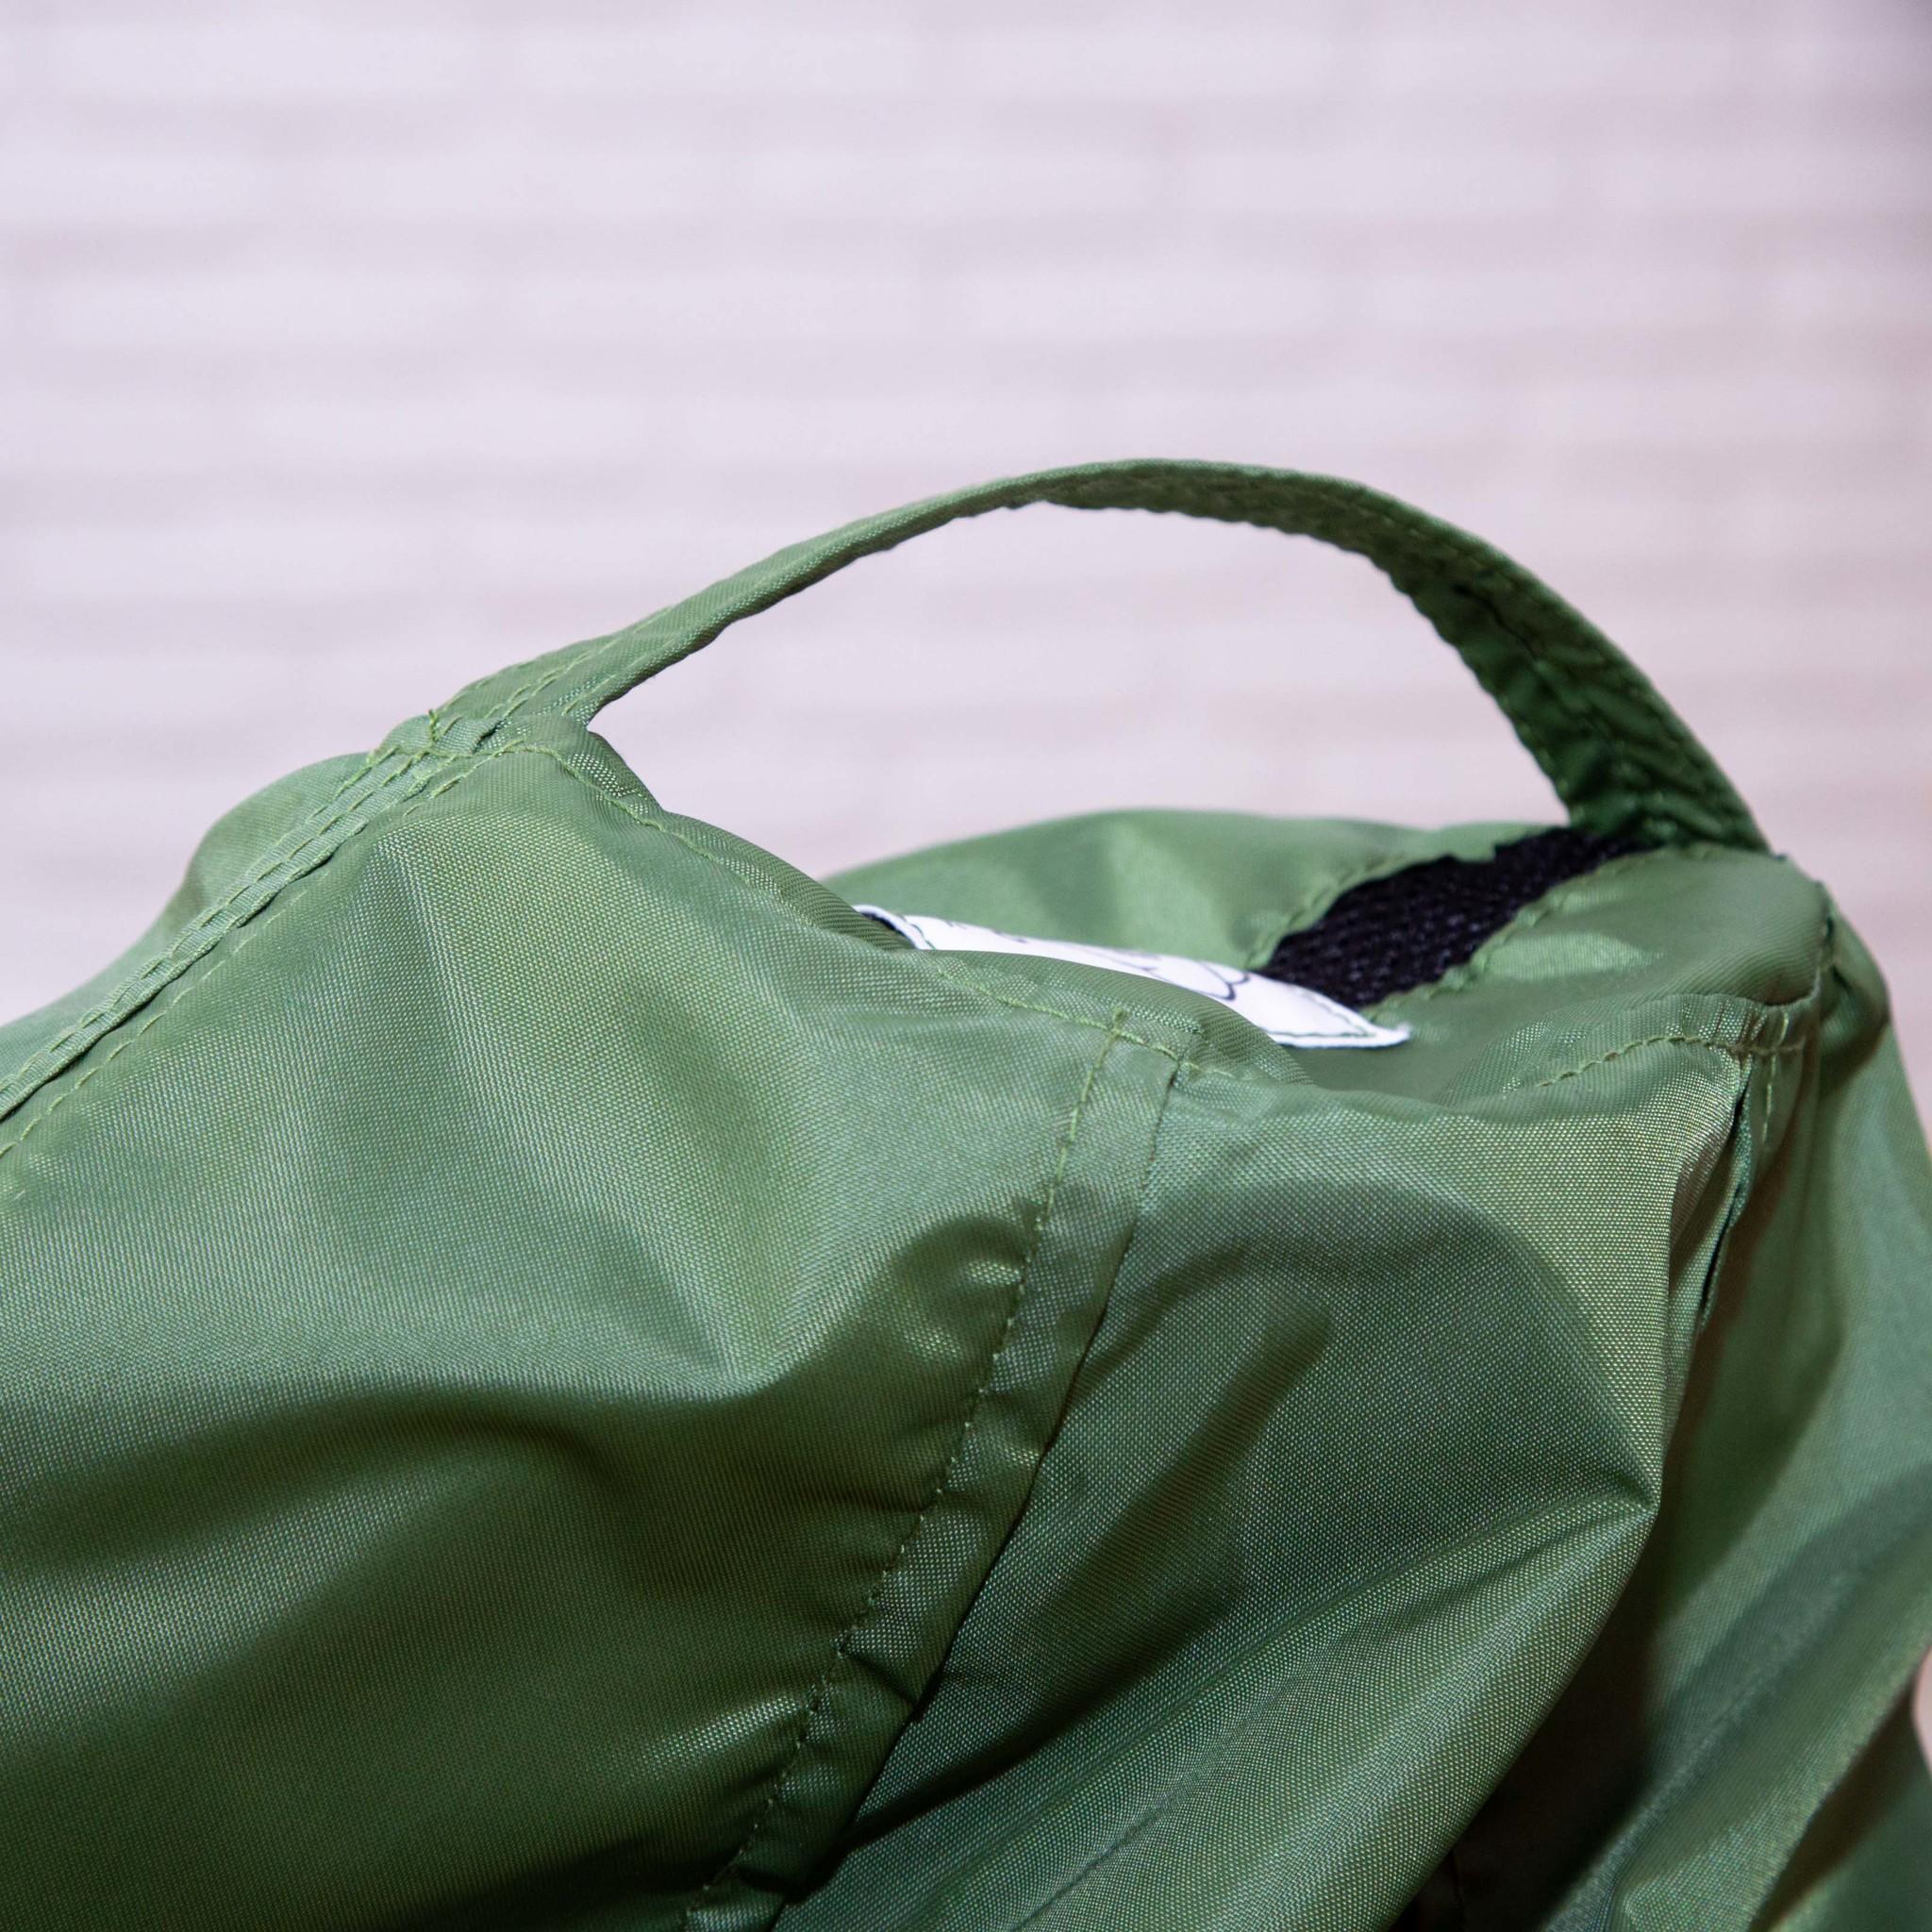 Груша M плащёвка, съёмный чехол (тёмно-зеленая)